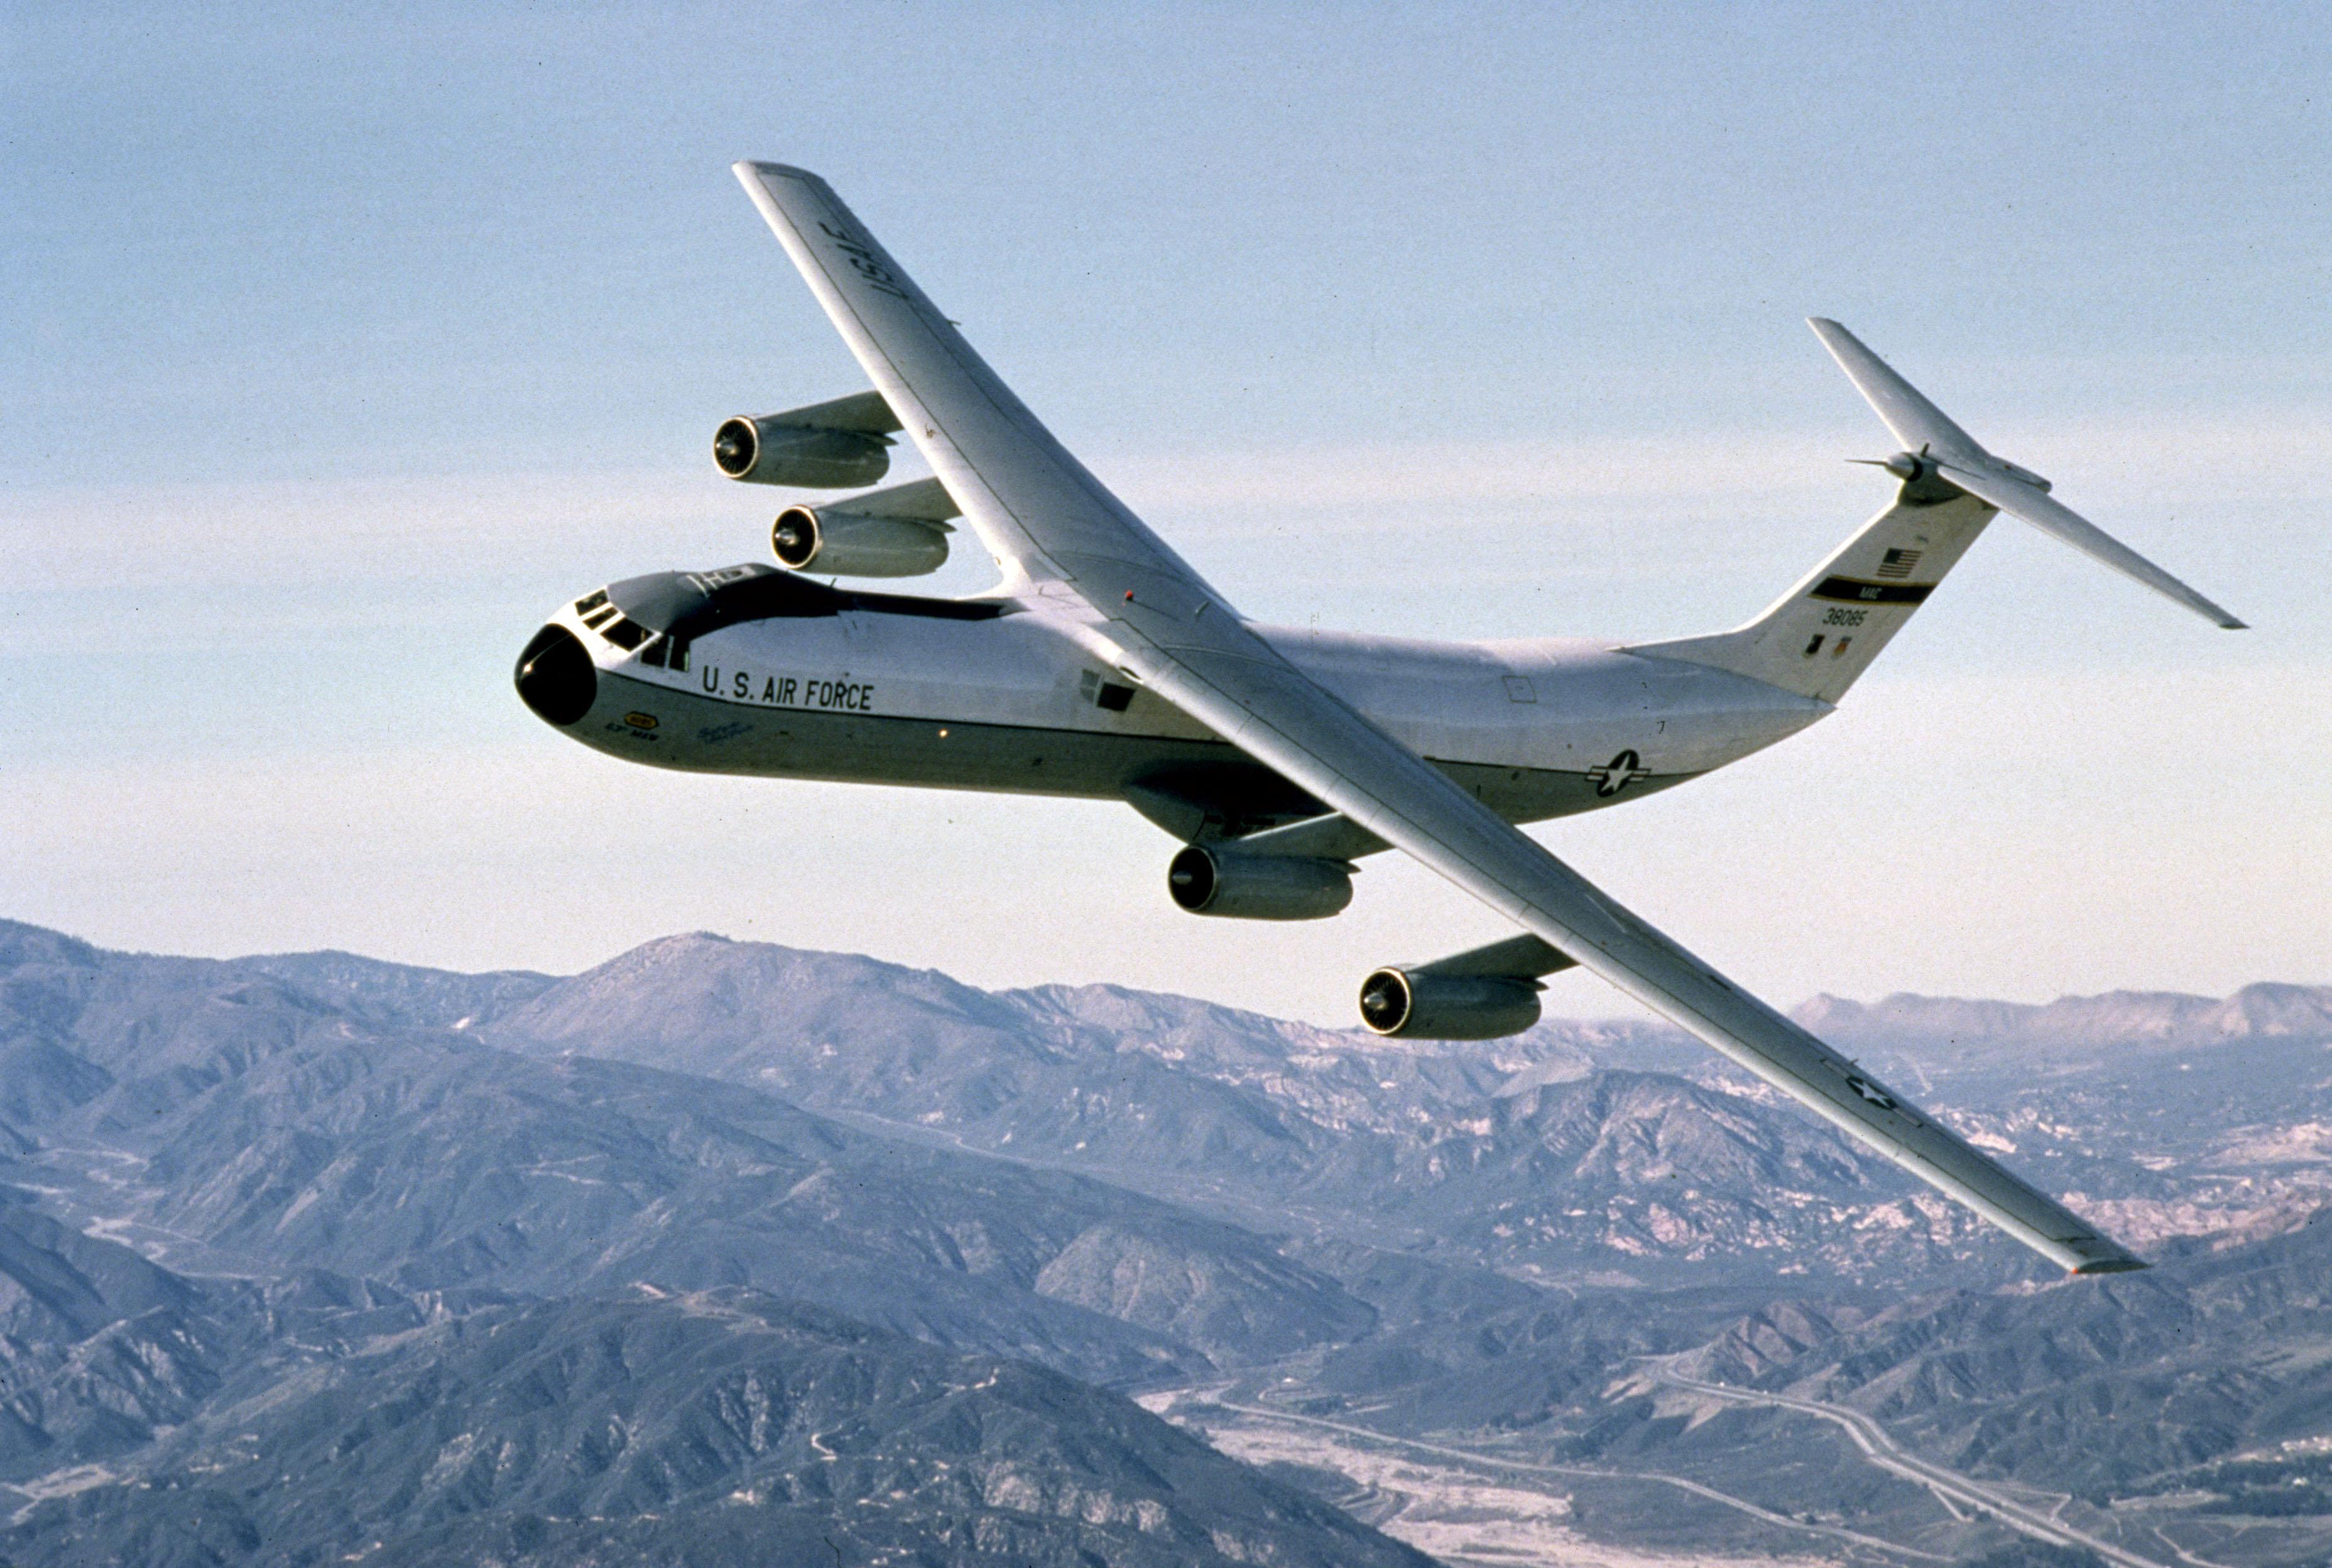 C-141_flying